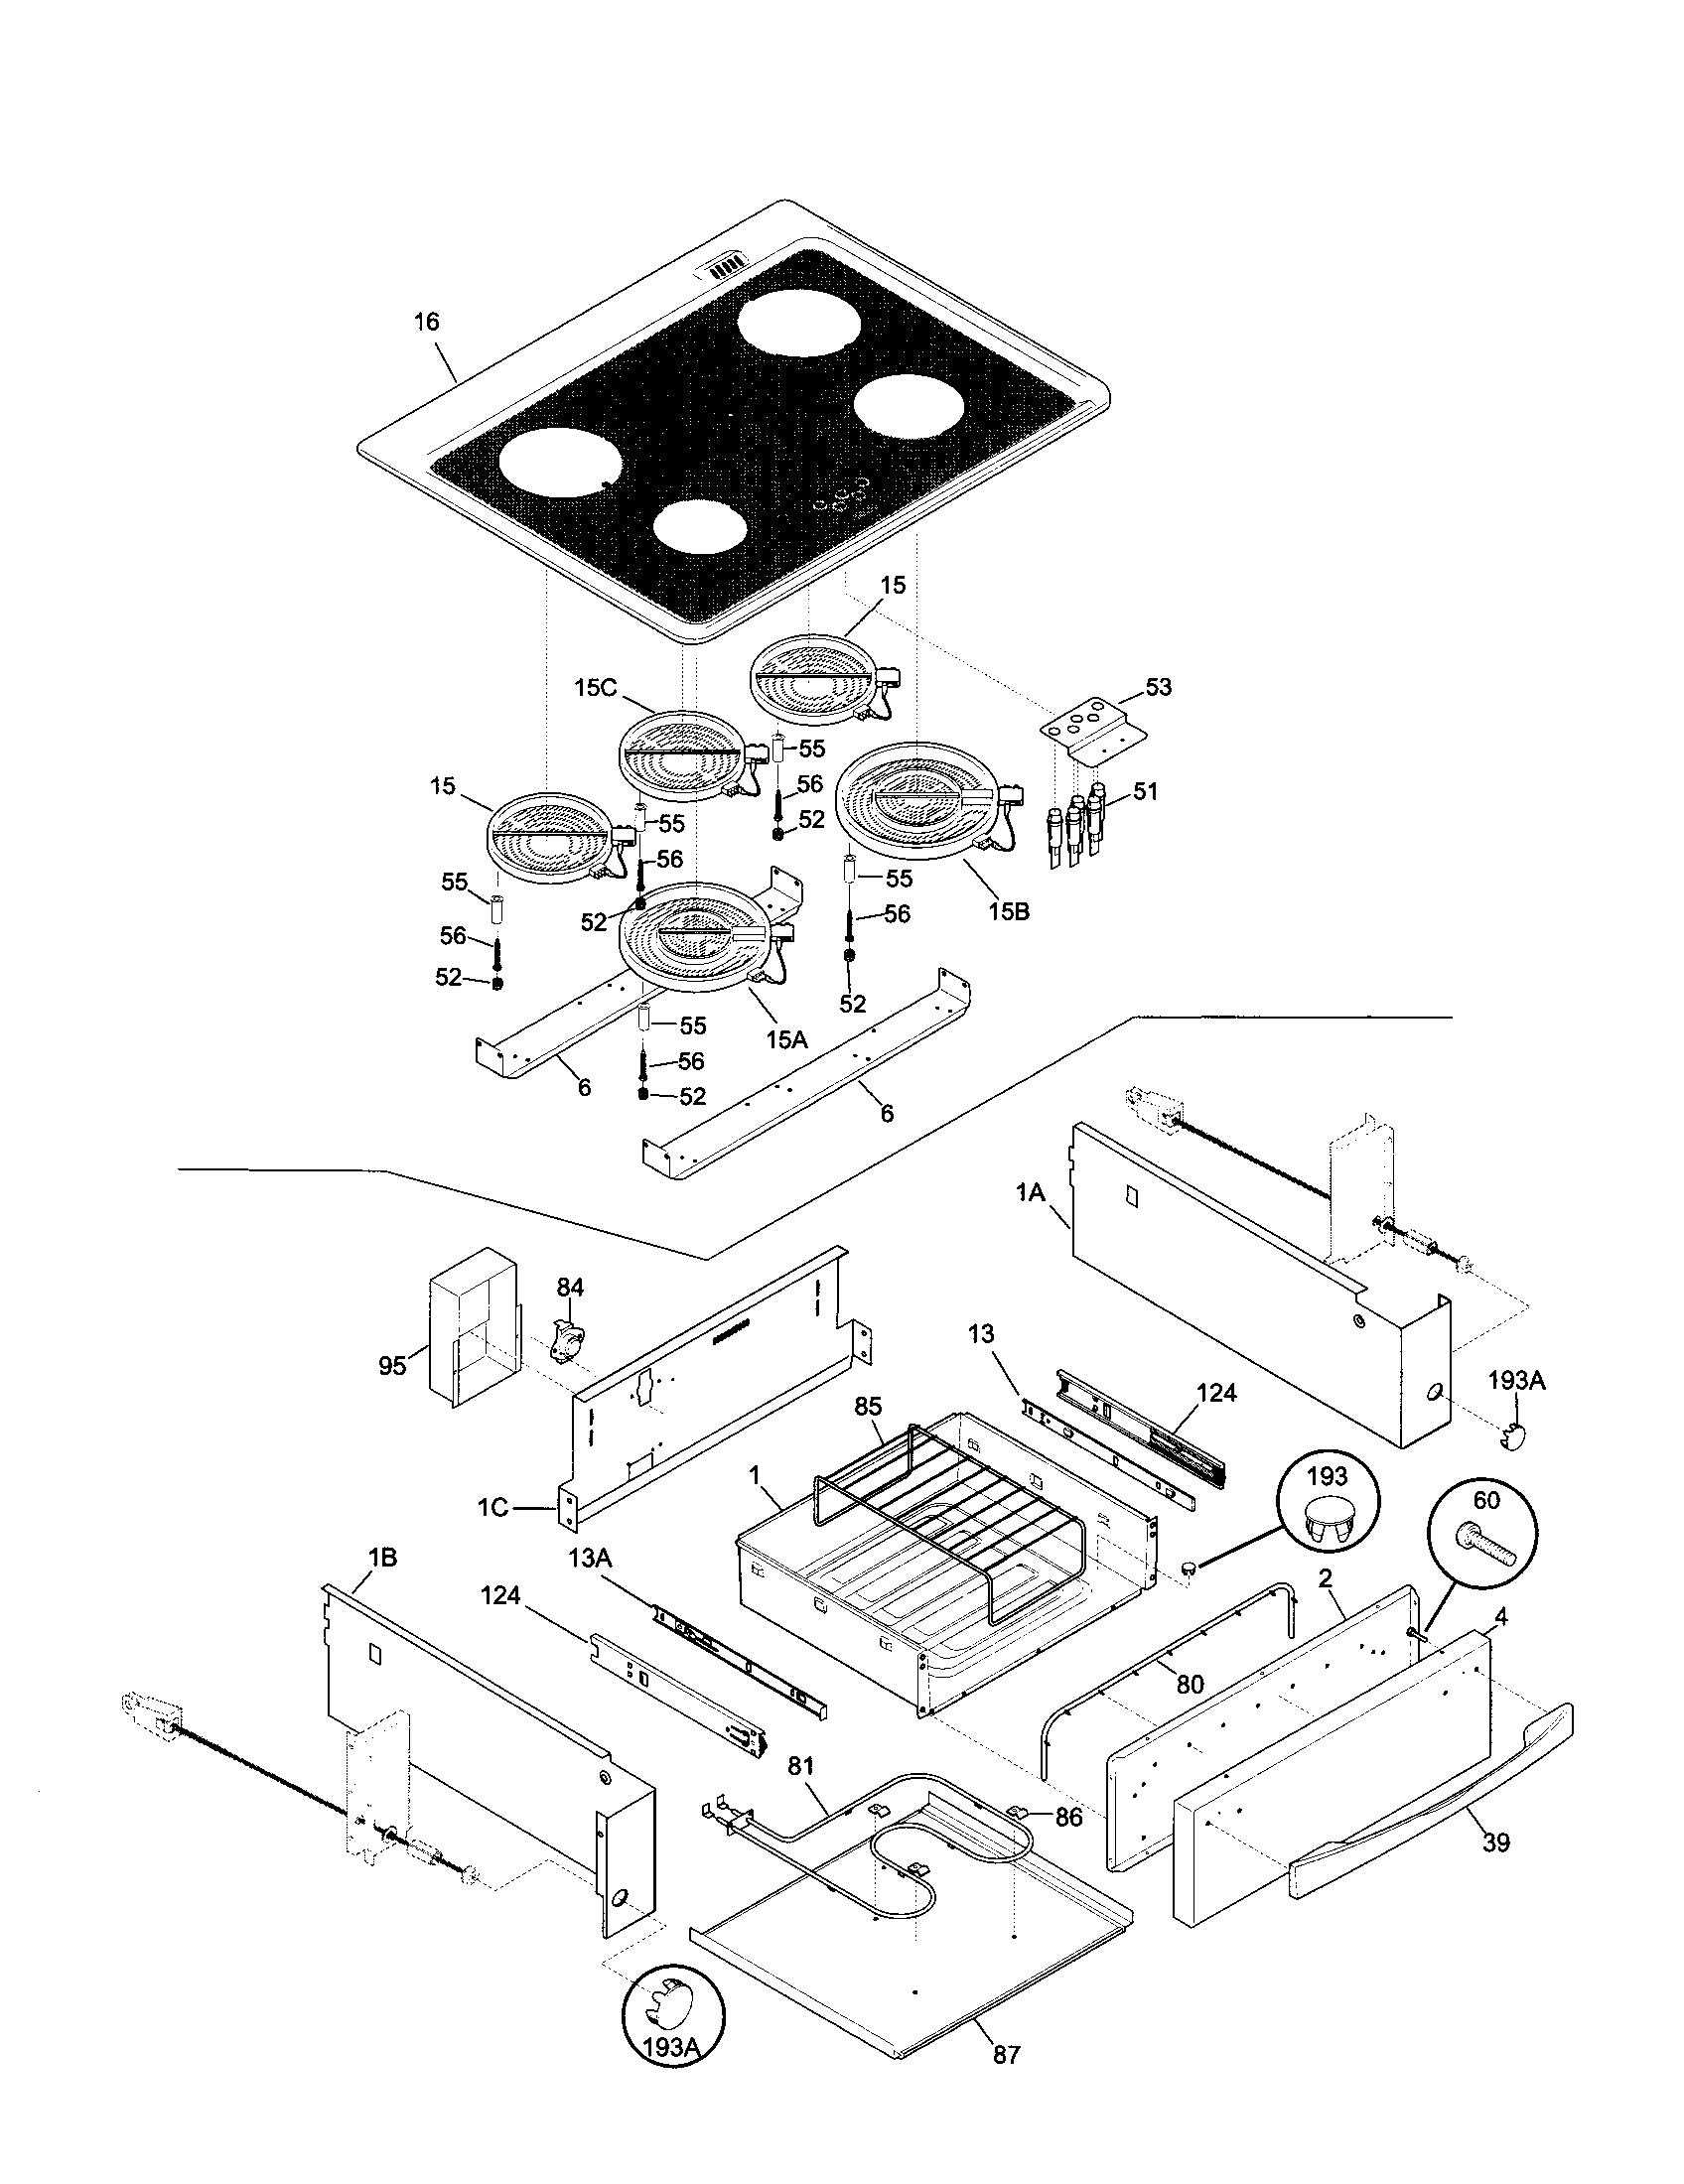 79046802992 elite electric slide in range top drawer parts diagram